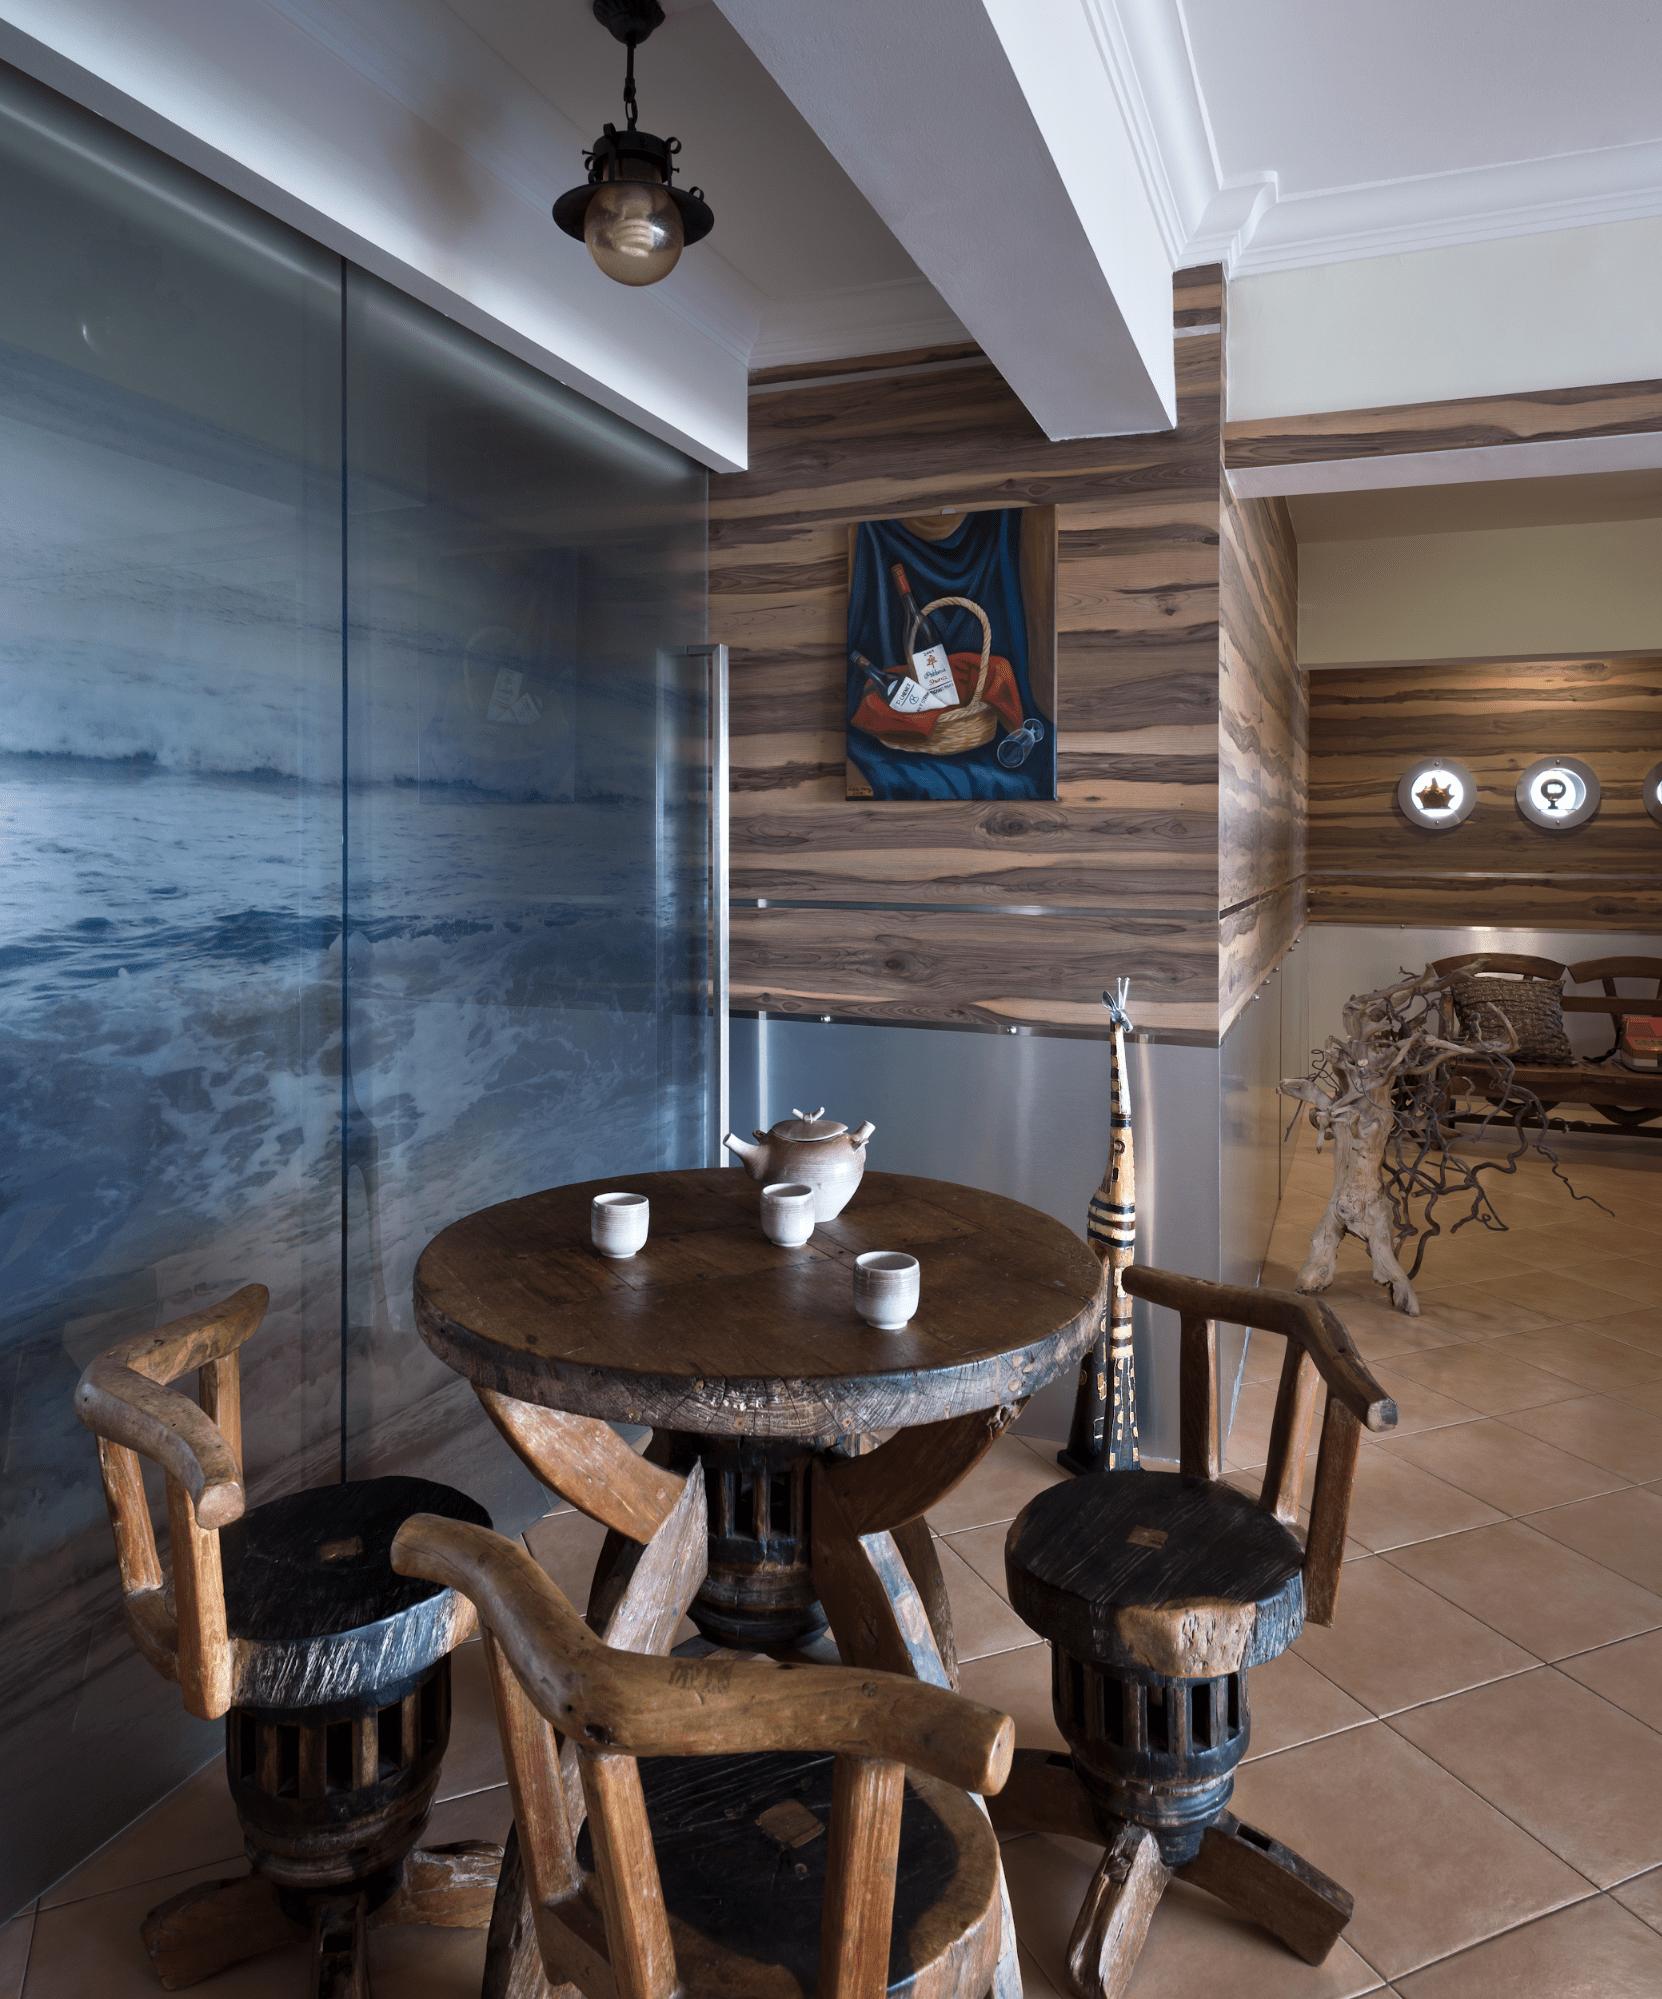 Boat-themed living room